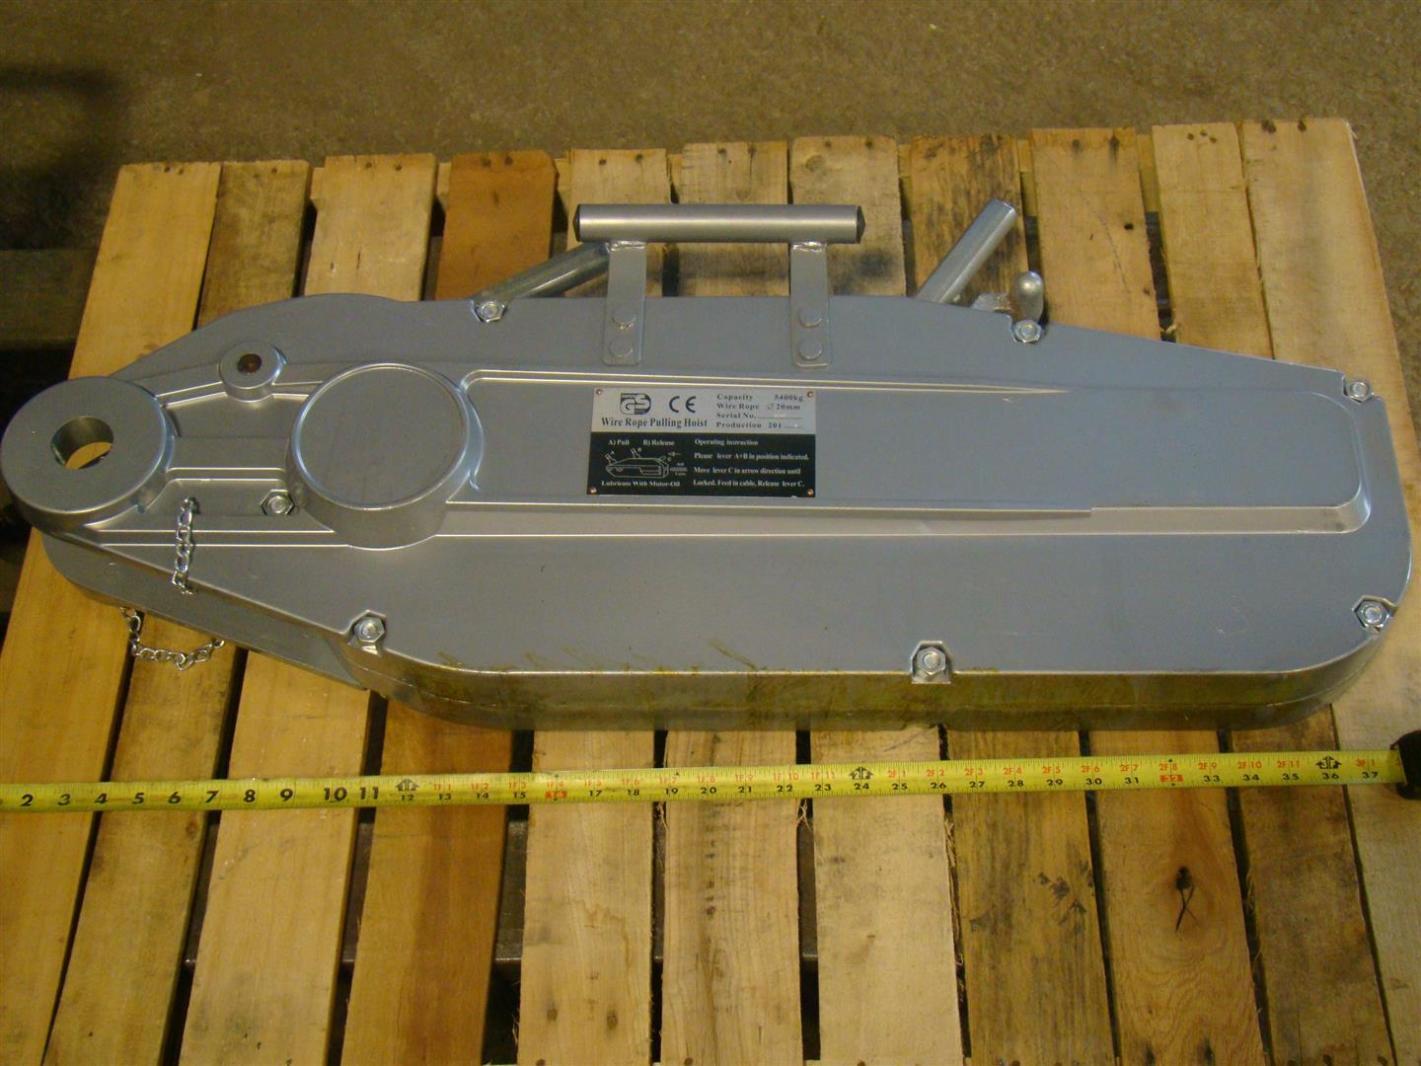 GS Alambre Cuerda Tirar Polipasto 20 mm 5400 Kg Cap. 15003 | eBay